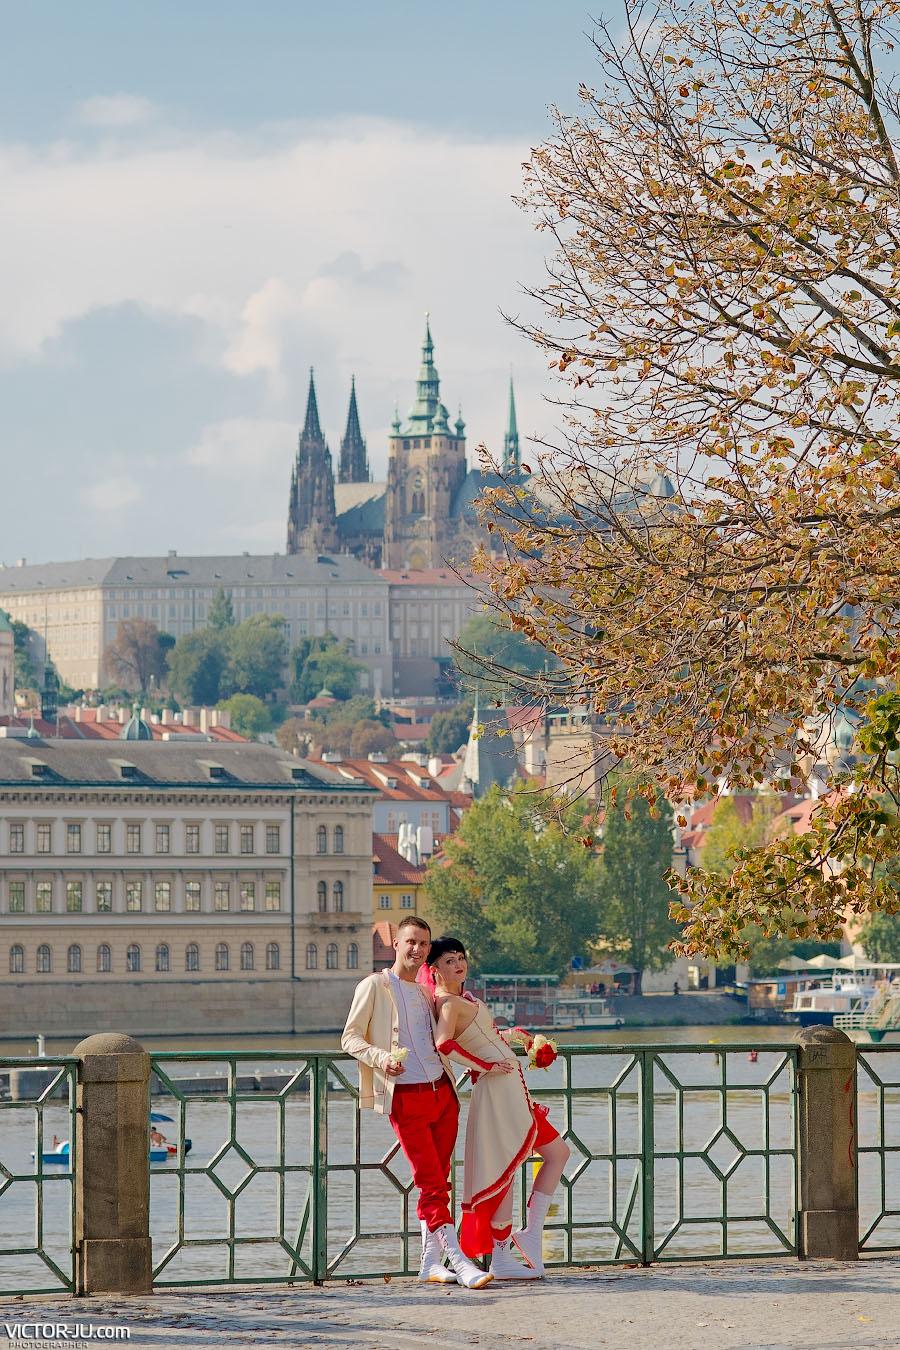 Фото на фоне Пражского града и реки Влтава в Праге